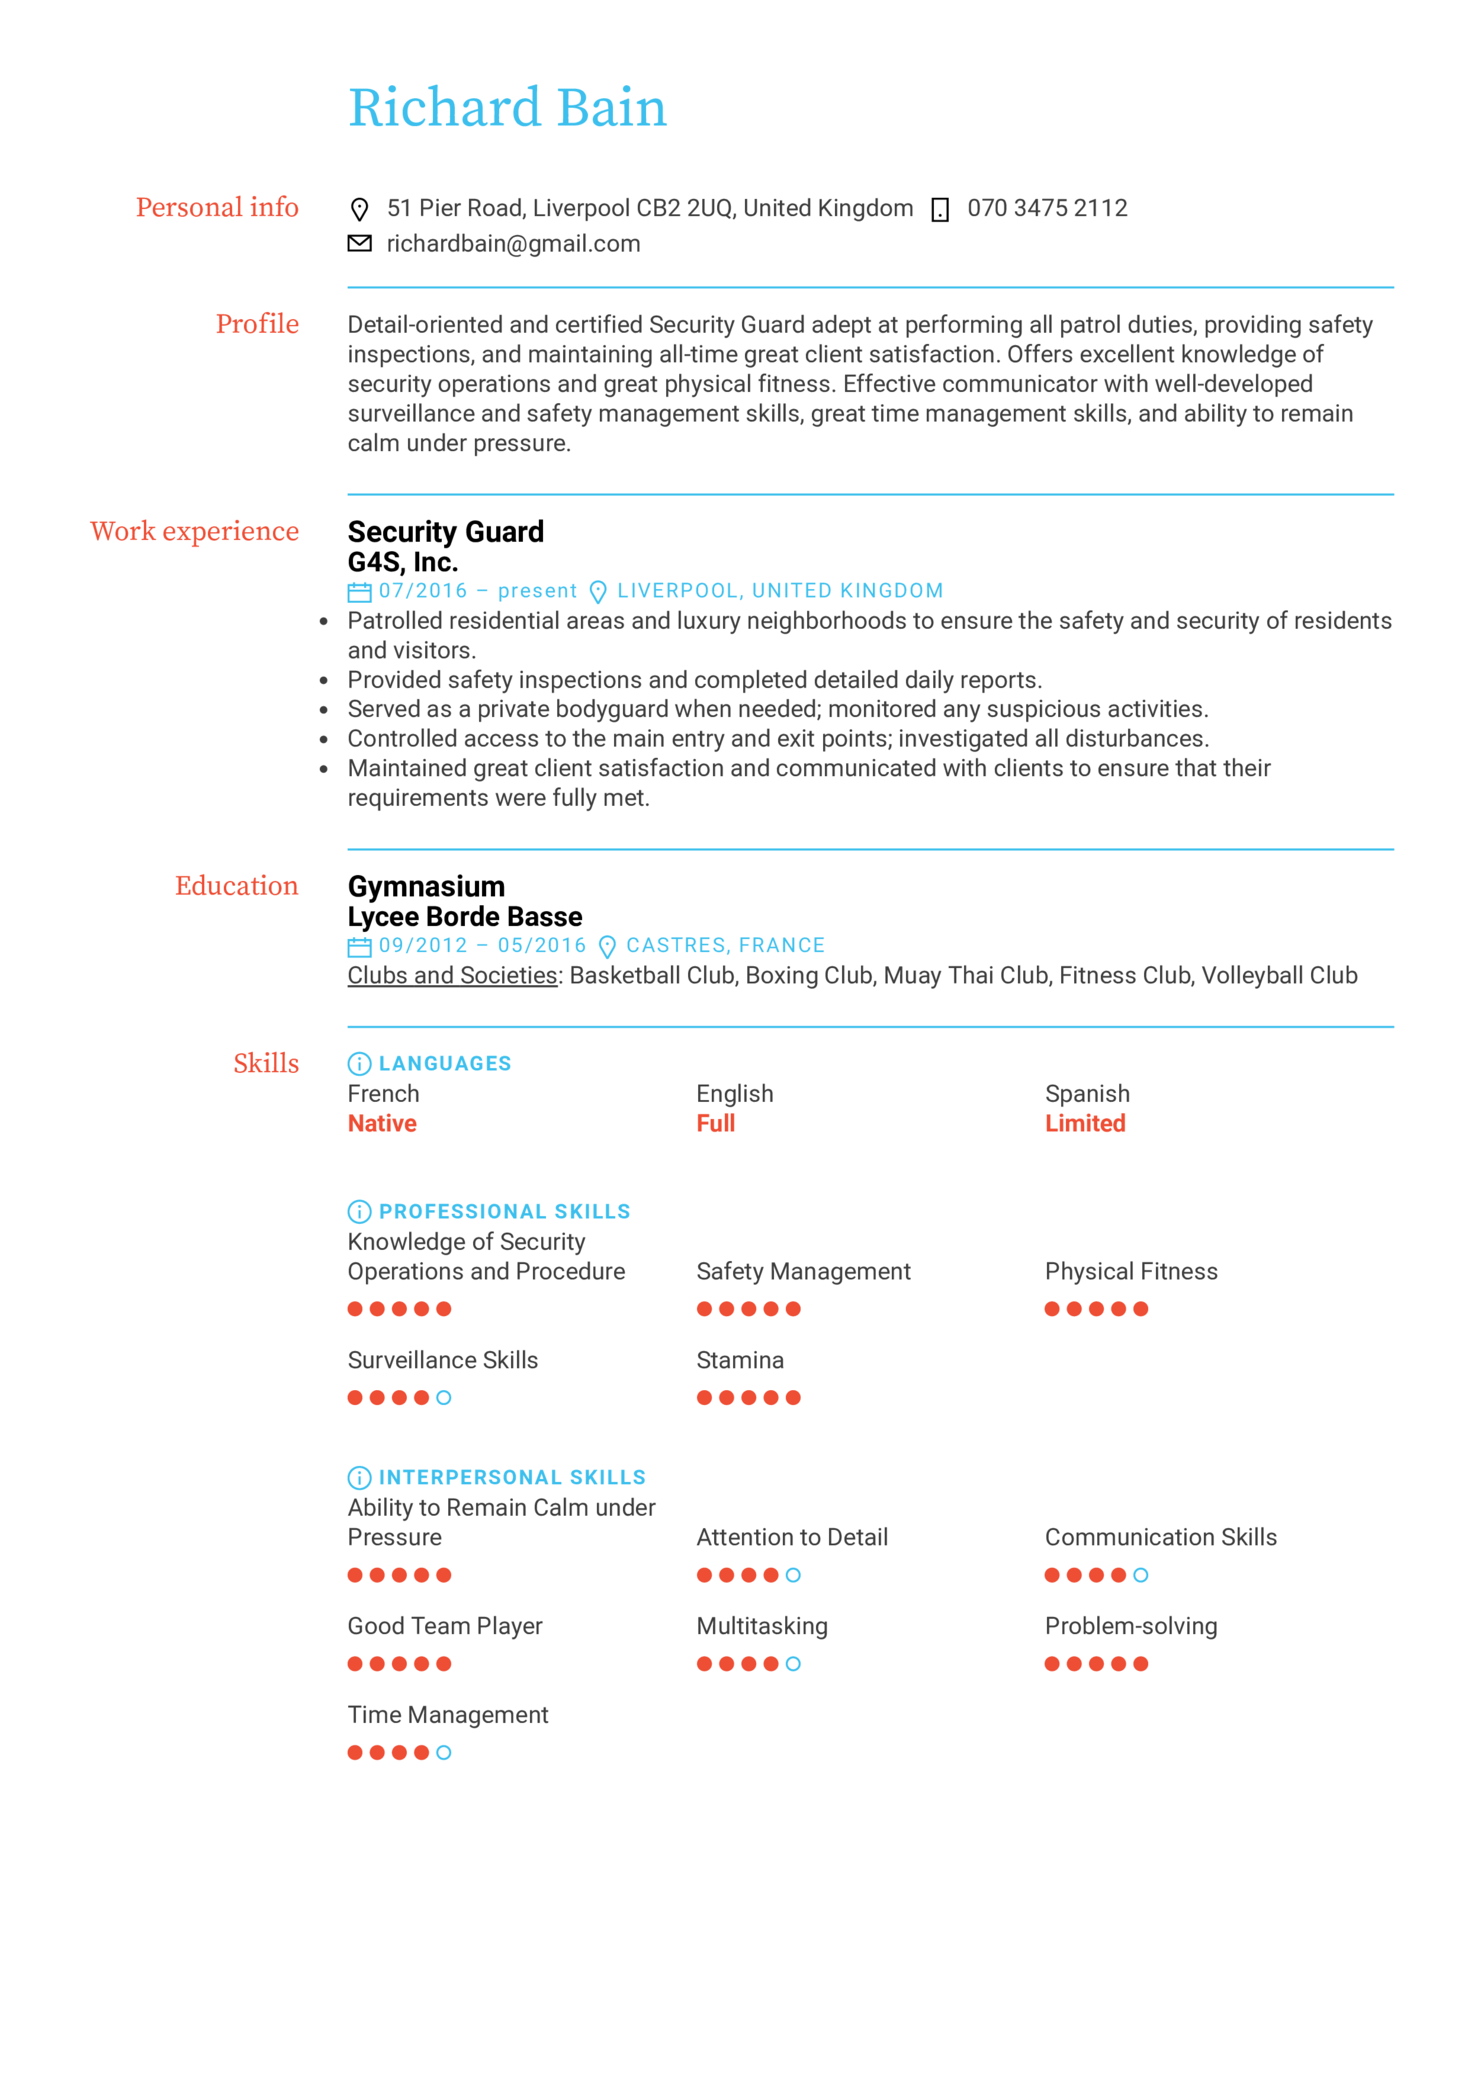 Security Guard Resume Example (časť 1)